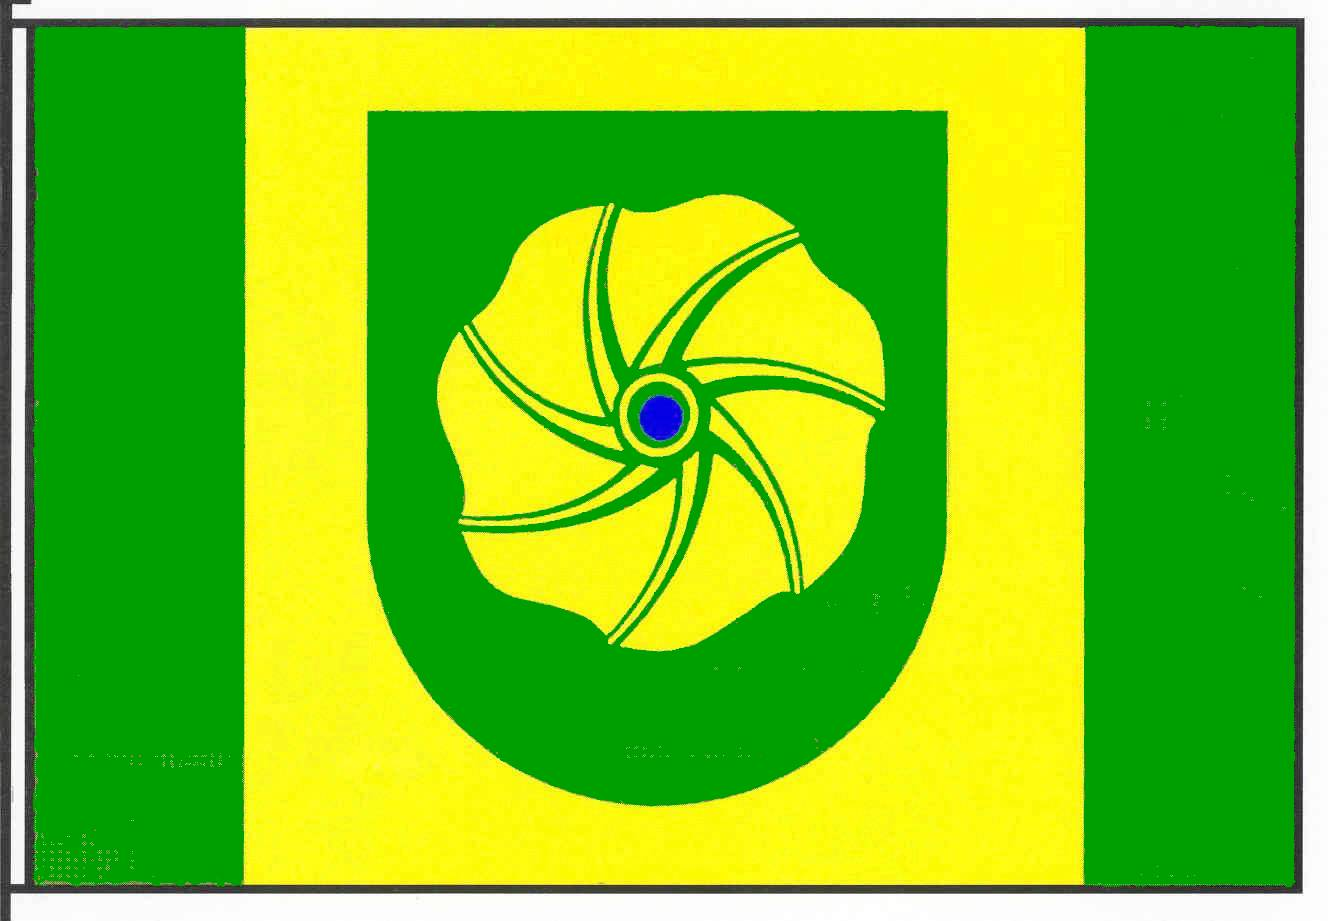 Flagge GemeindeHelse, Kreis Dithmarschen